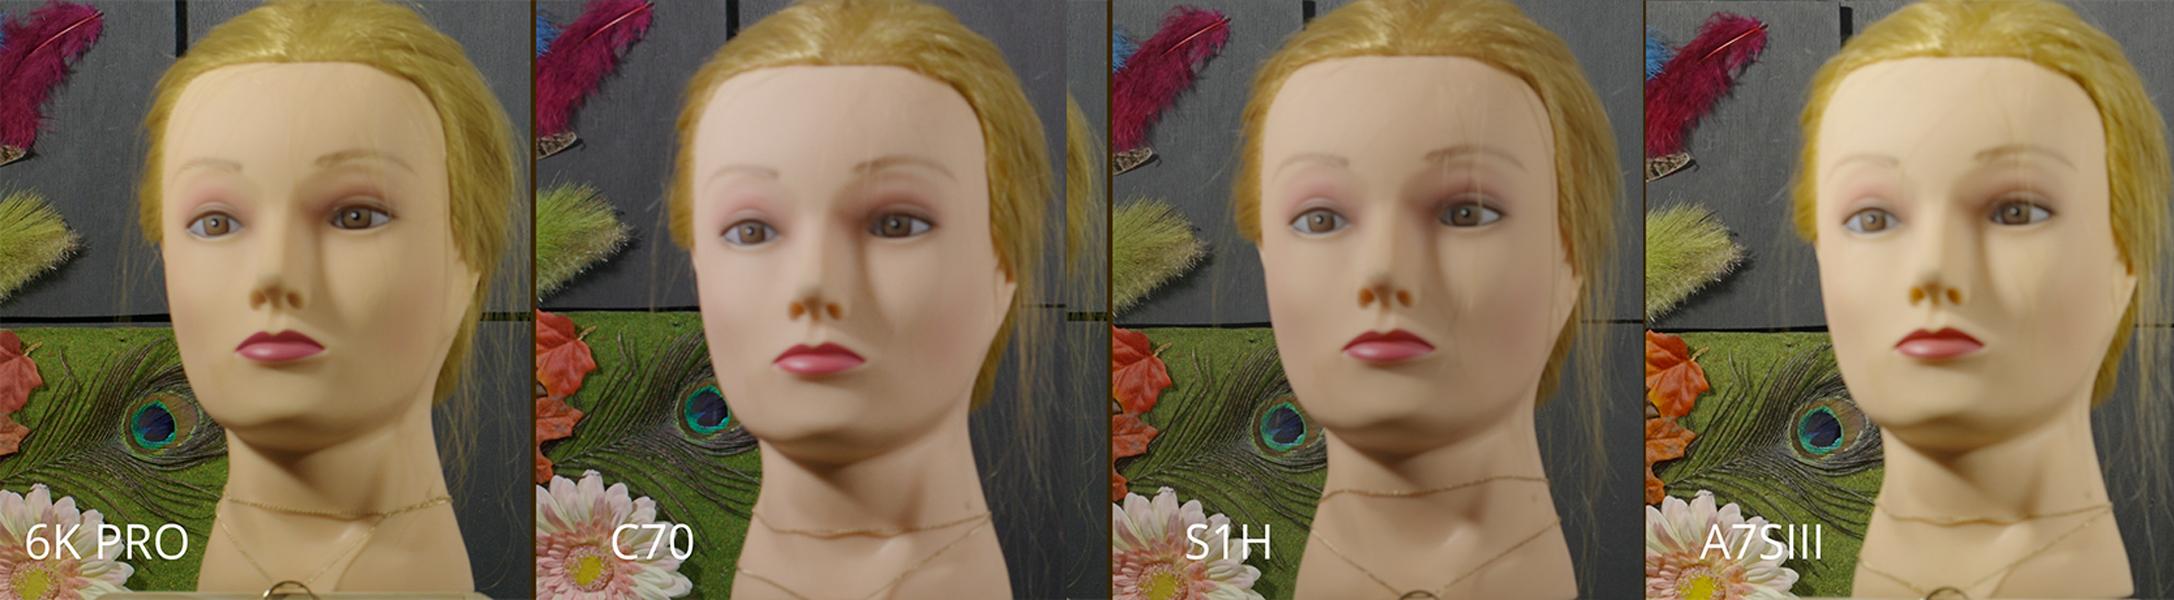 comparaison-skin-tones-PF.jpg